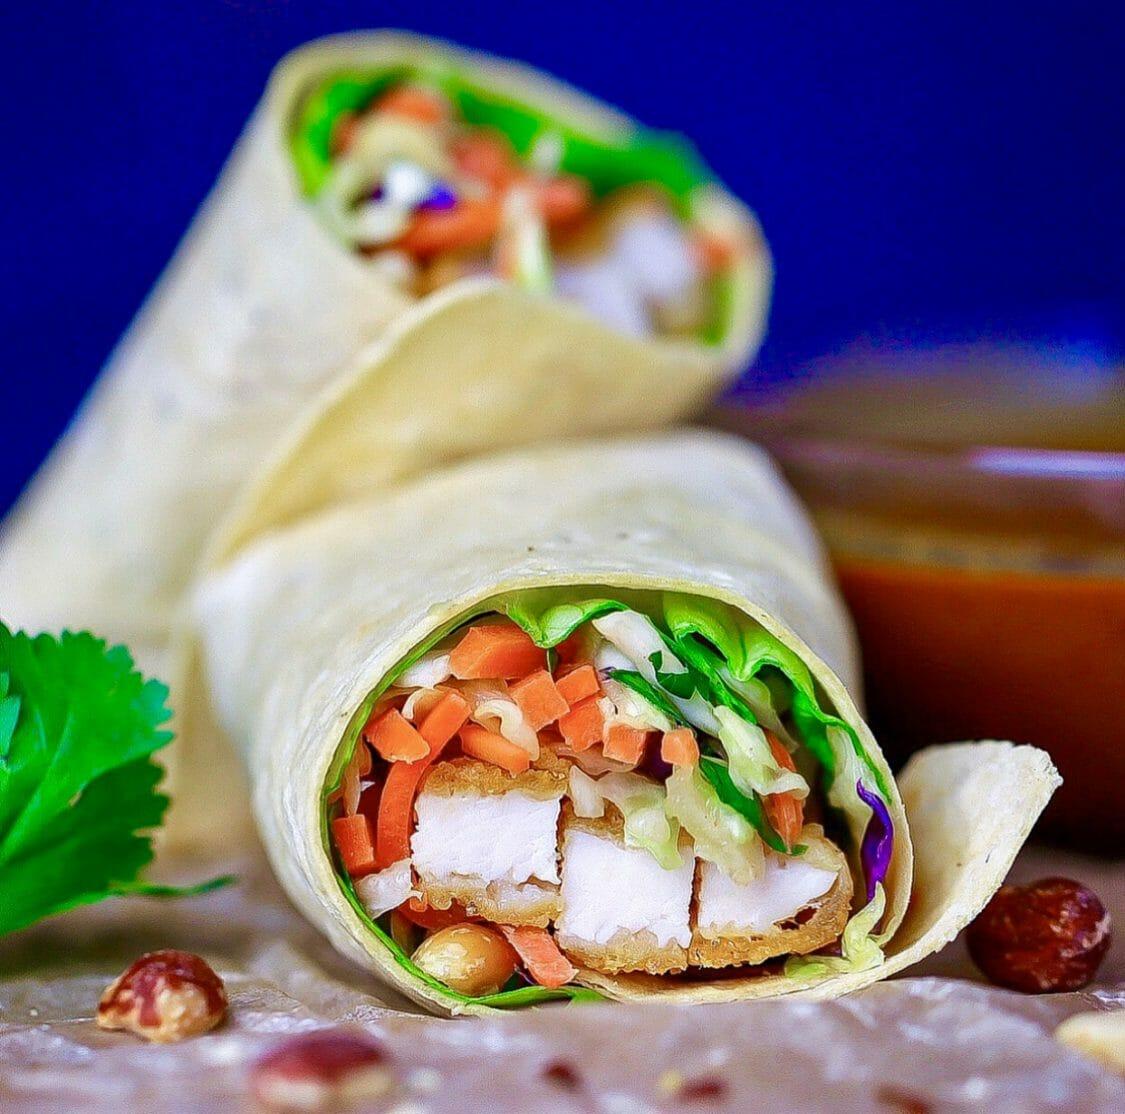 Crispy Chicken Wrap With Thai Peanut Sauce